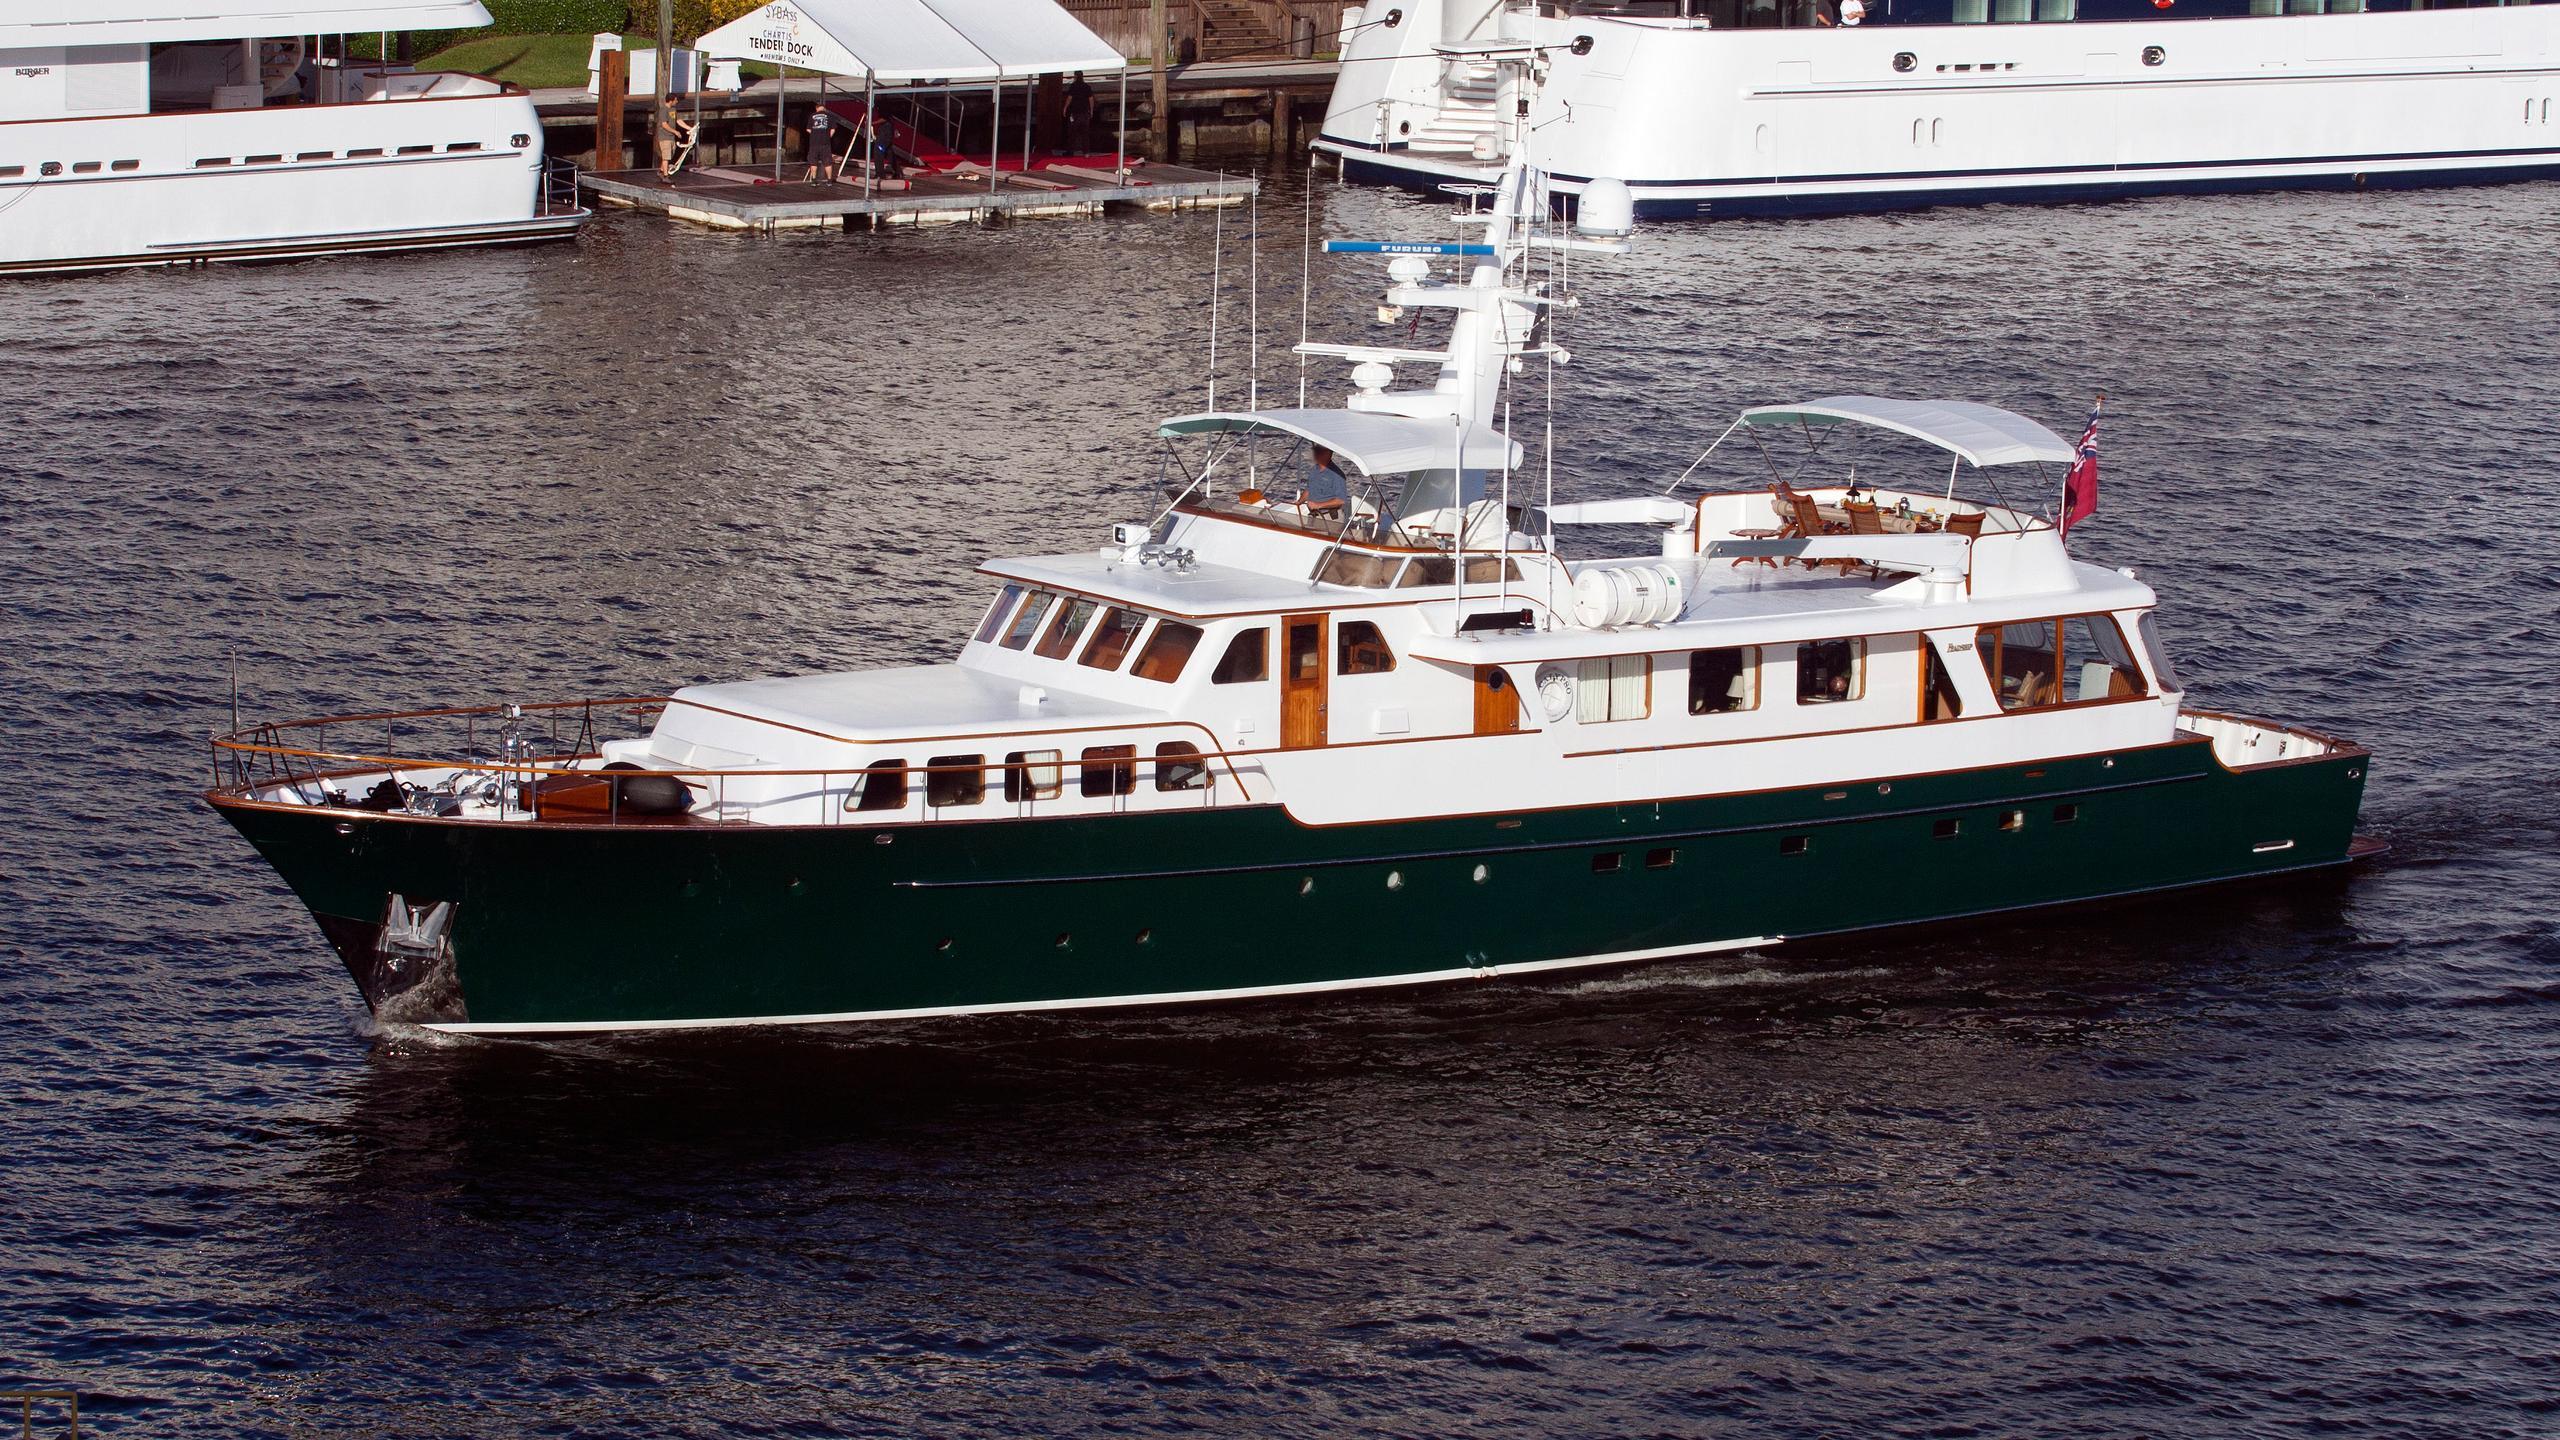 calypso-motor-yacht-feadship-1971-31m-running-profile